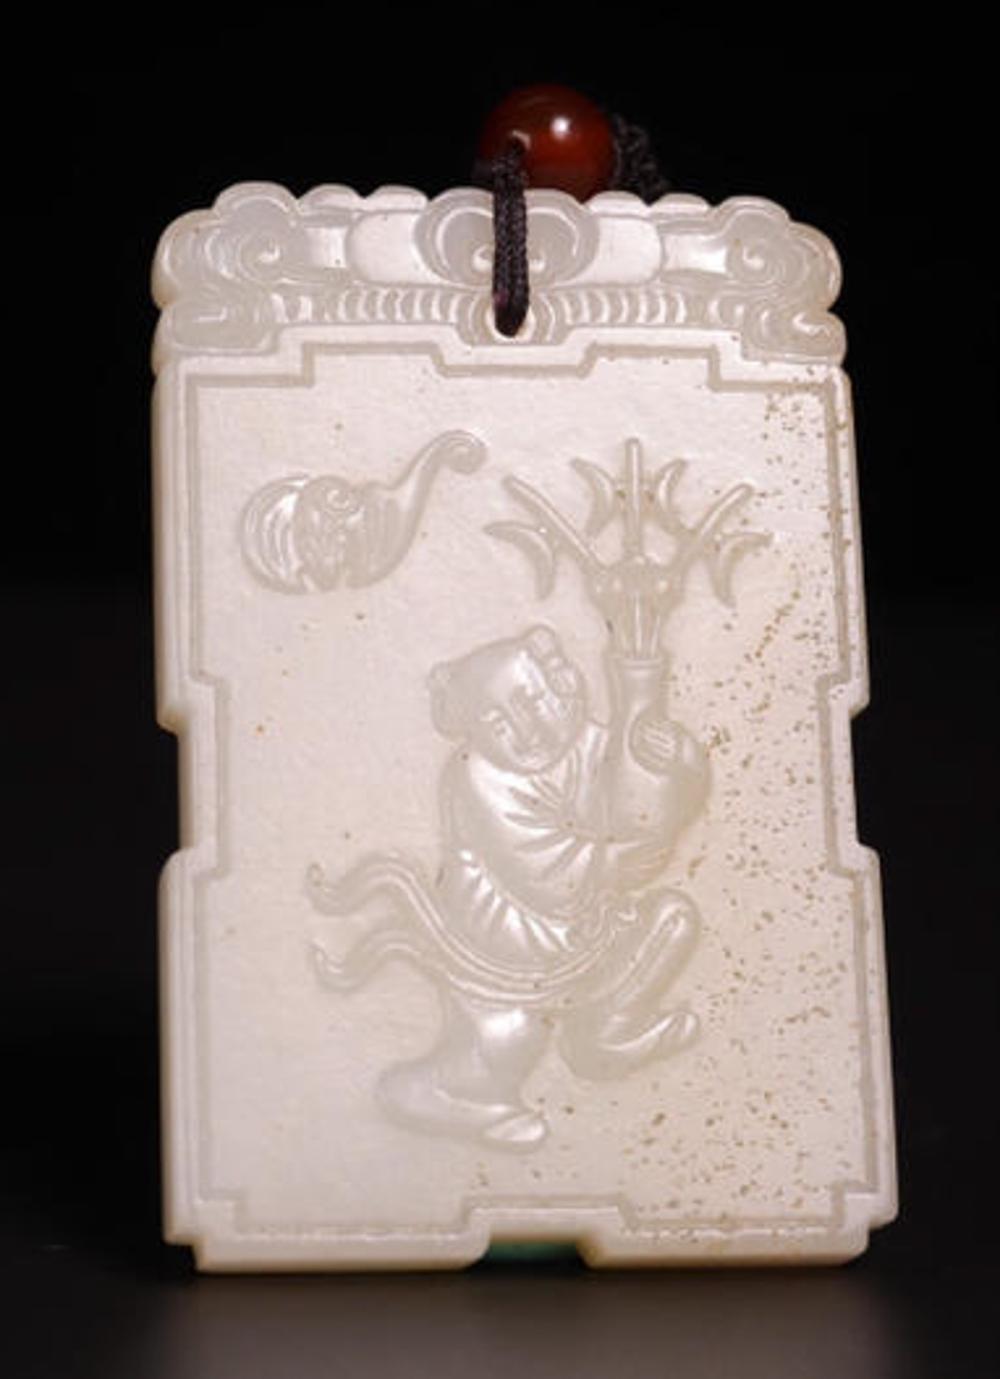 A HETIAN JADE 'PING SHENG SAN JI' SQUARE TABLET